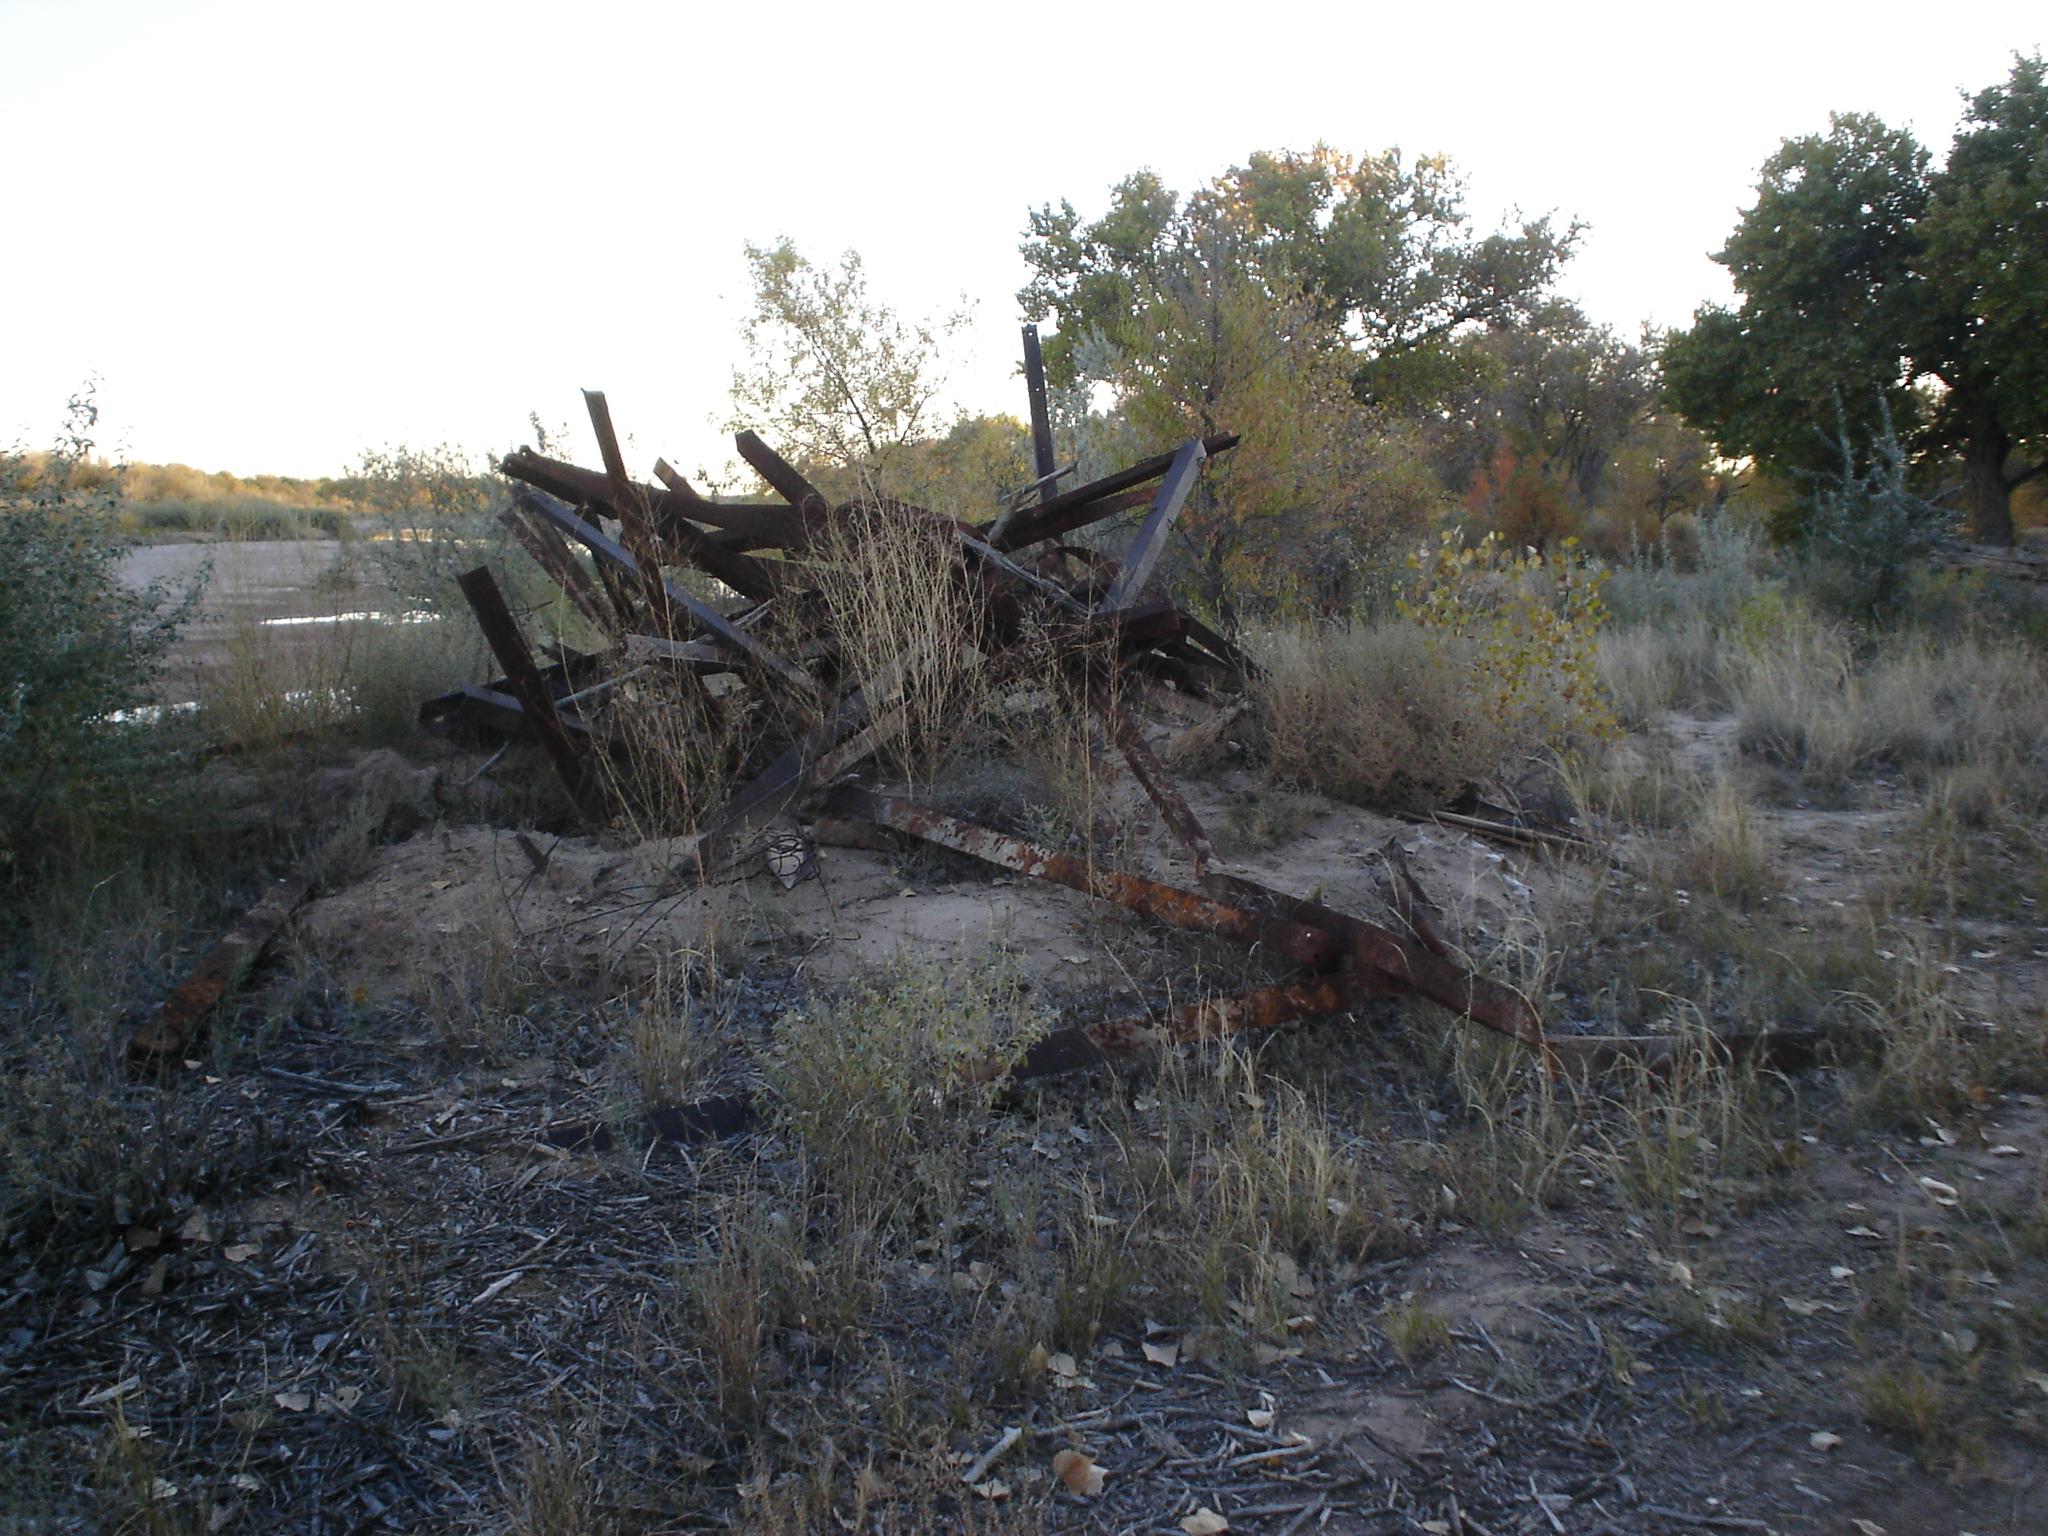 Original Site Condition, Fall 2008 Rio Grande Bosque, Albuquerque New Mexico